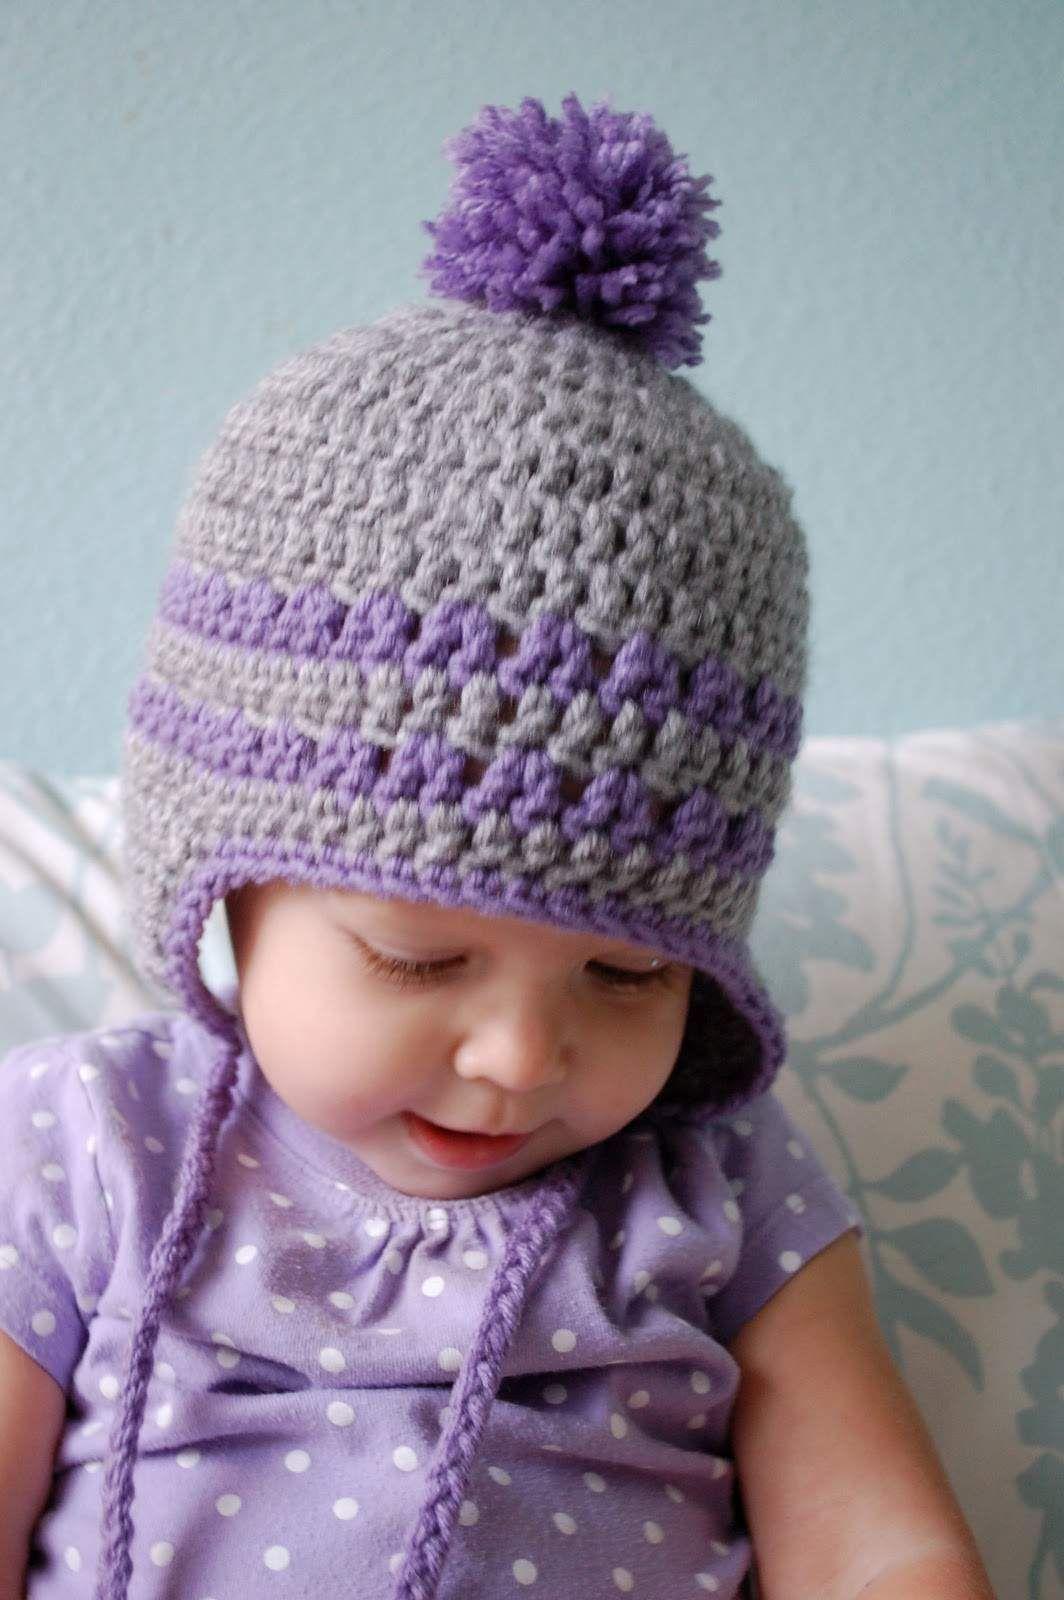 Alli Crafts Free Pattern Earflap Hat 9 12 Monate : Alli ...